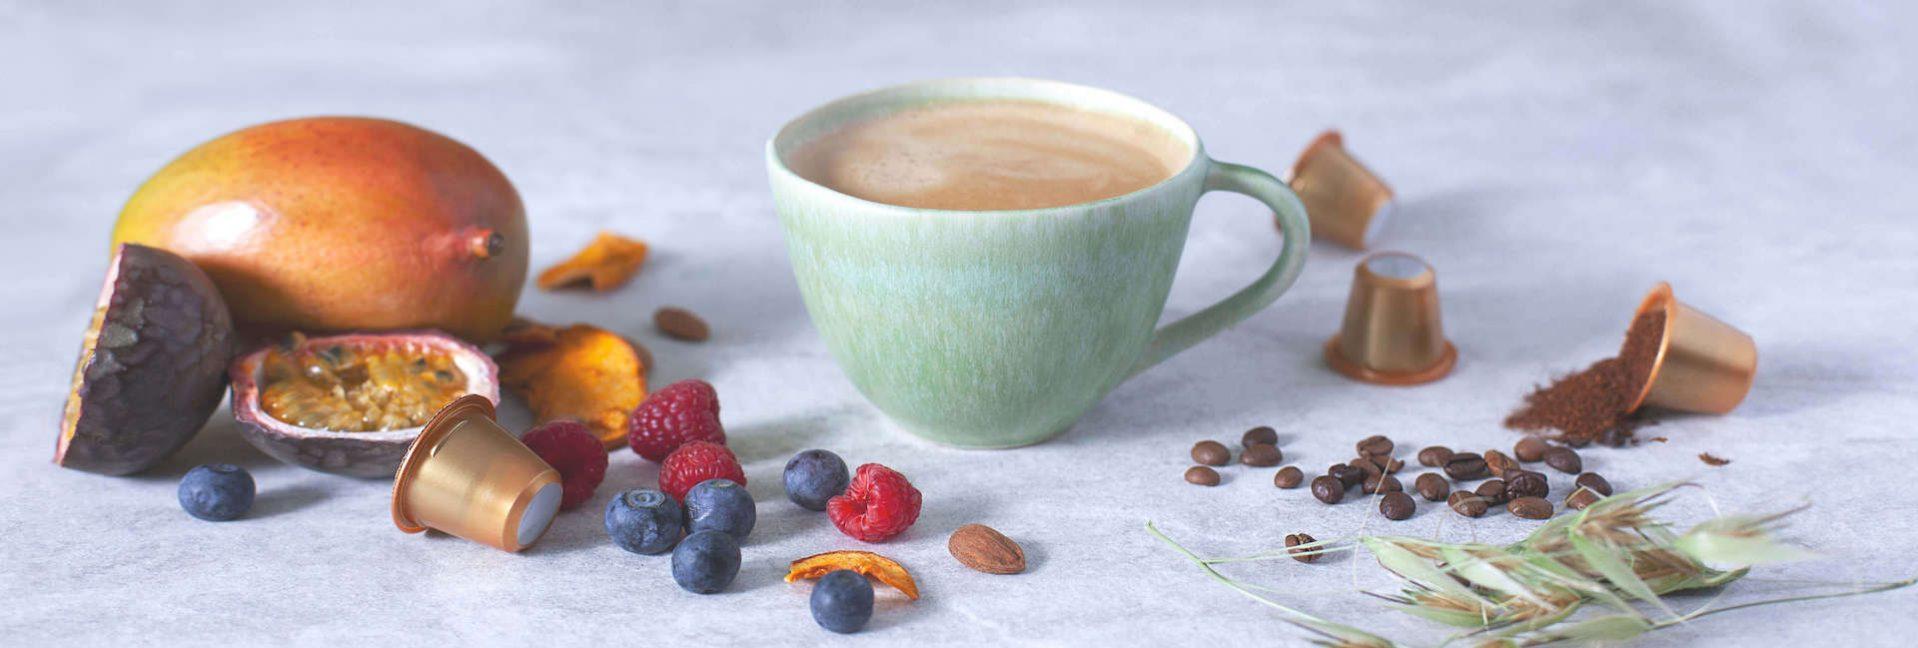 venta de cafe capsulas molido grano